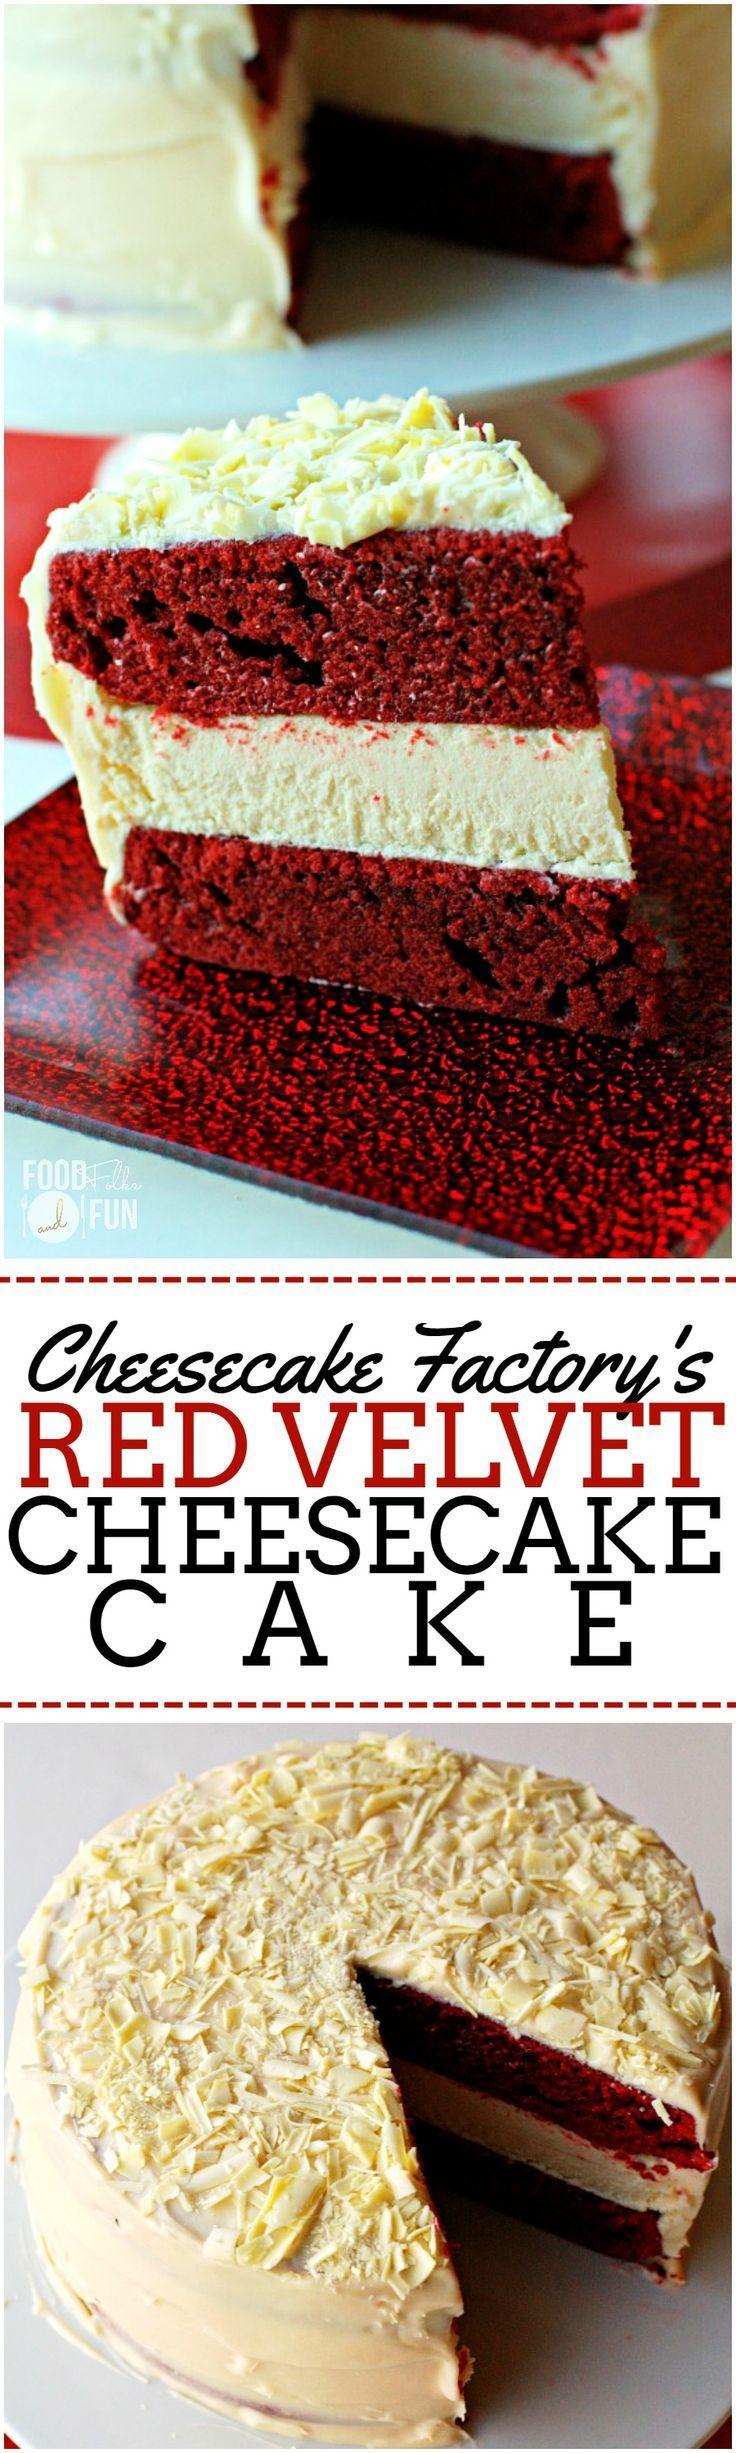 Red Velvet Cheesecake Cake - The Cheesecake Factory copycat recipe!